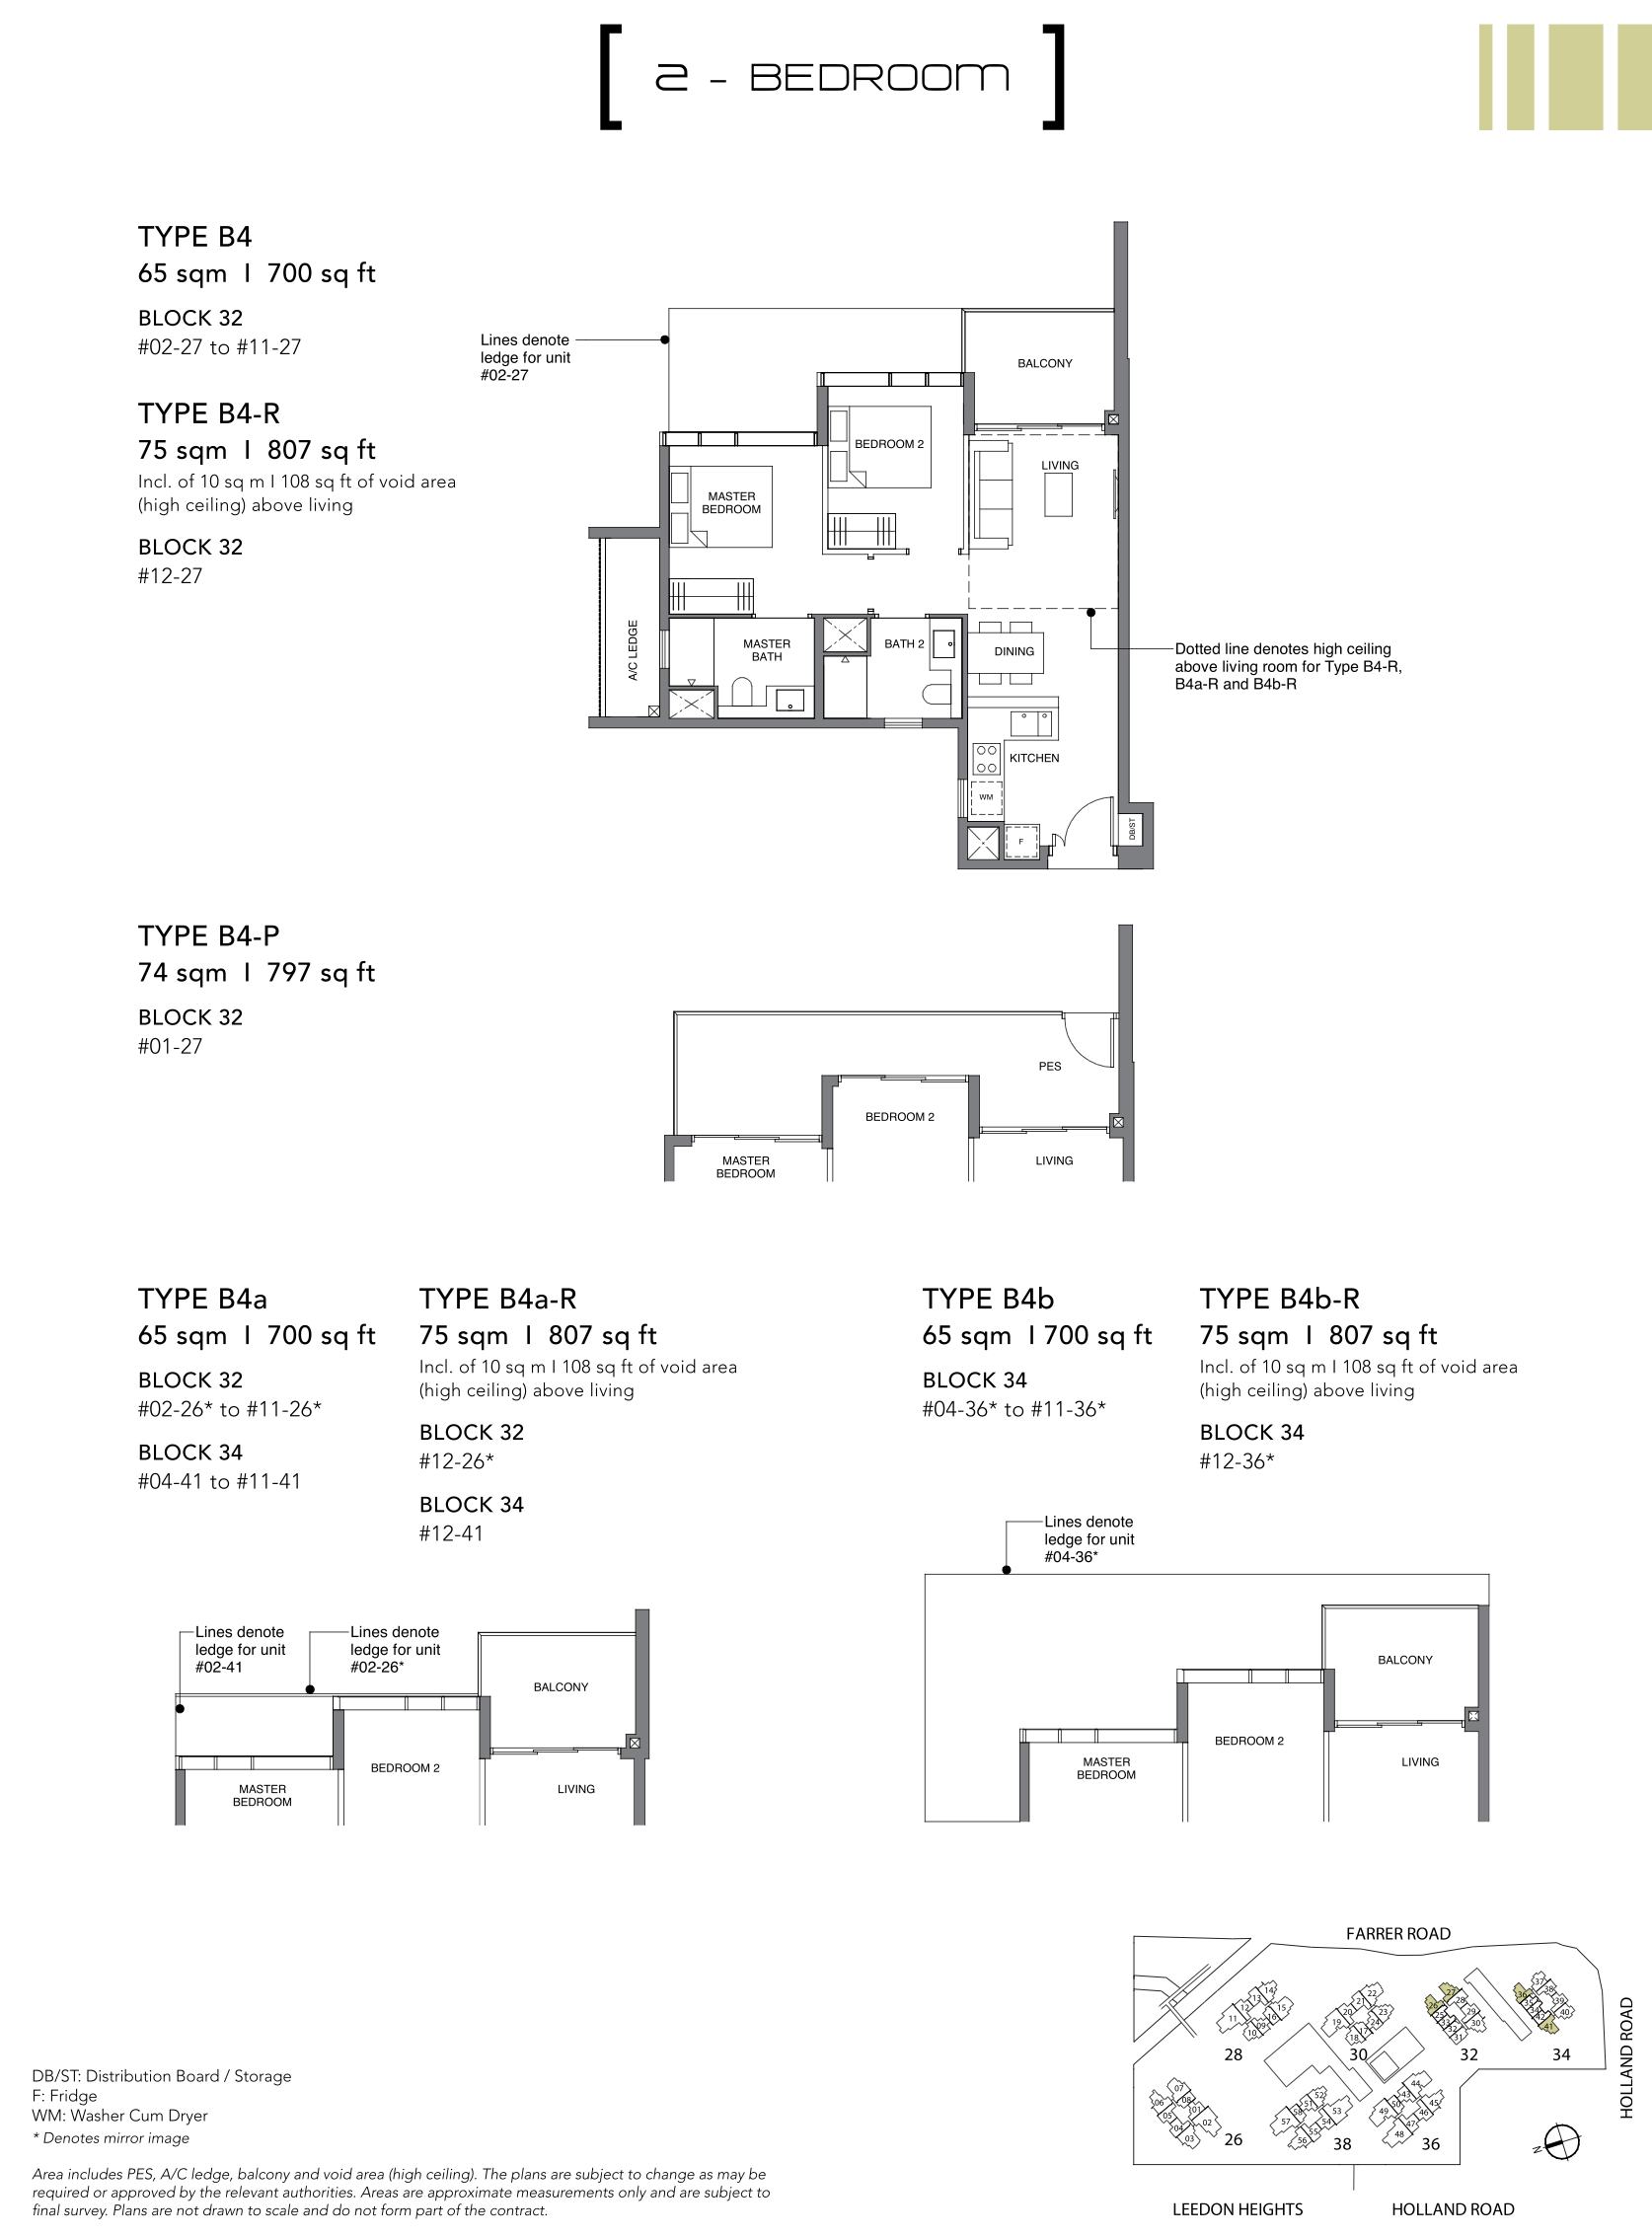 绿墩雅苑公寓户型图 Leedon Green floor plan 2 bedroom b4-b4a-b4b